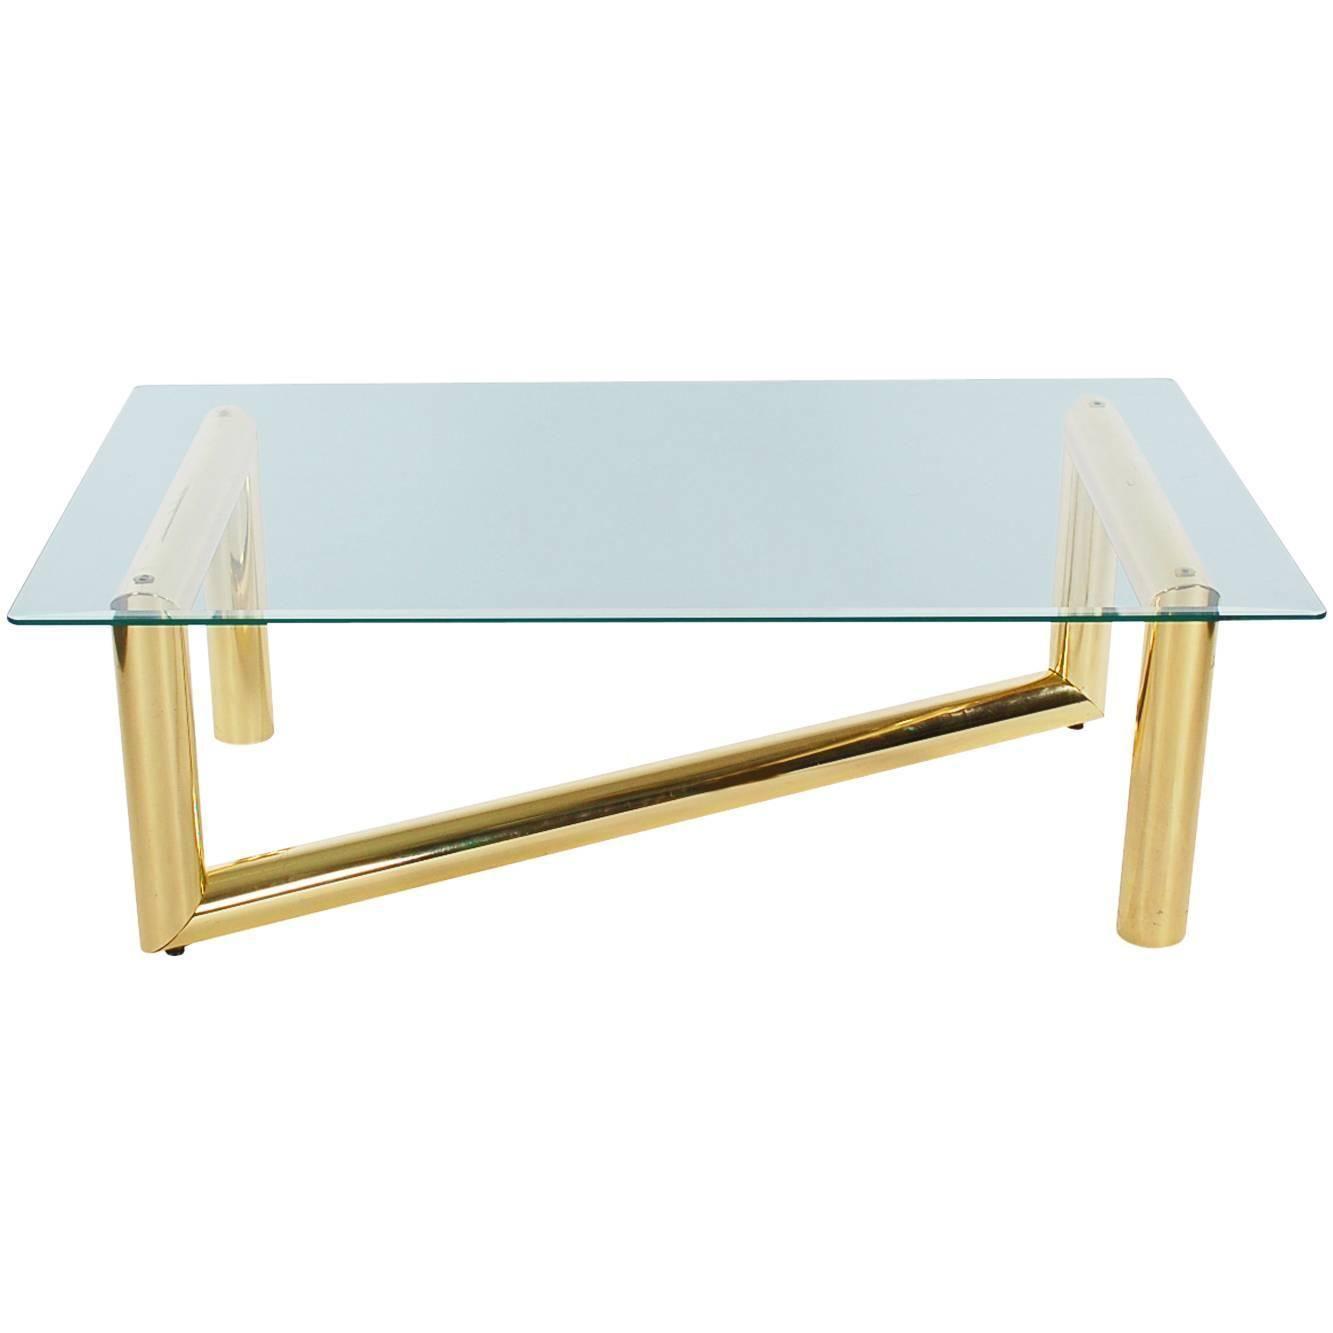 Mid Century Modern Brass Tubular And Glass Coffee Table Glass Coffee Table Glass Mid Century Modern [ 1333 x 1333 Pixel ]